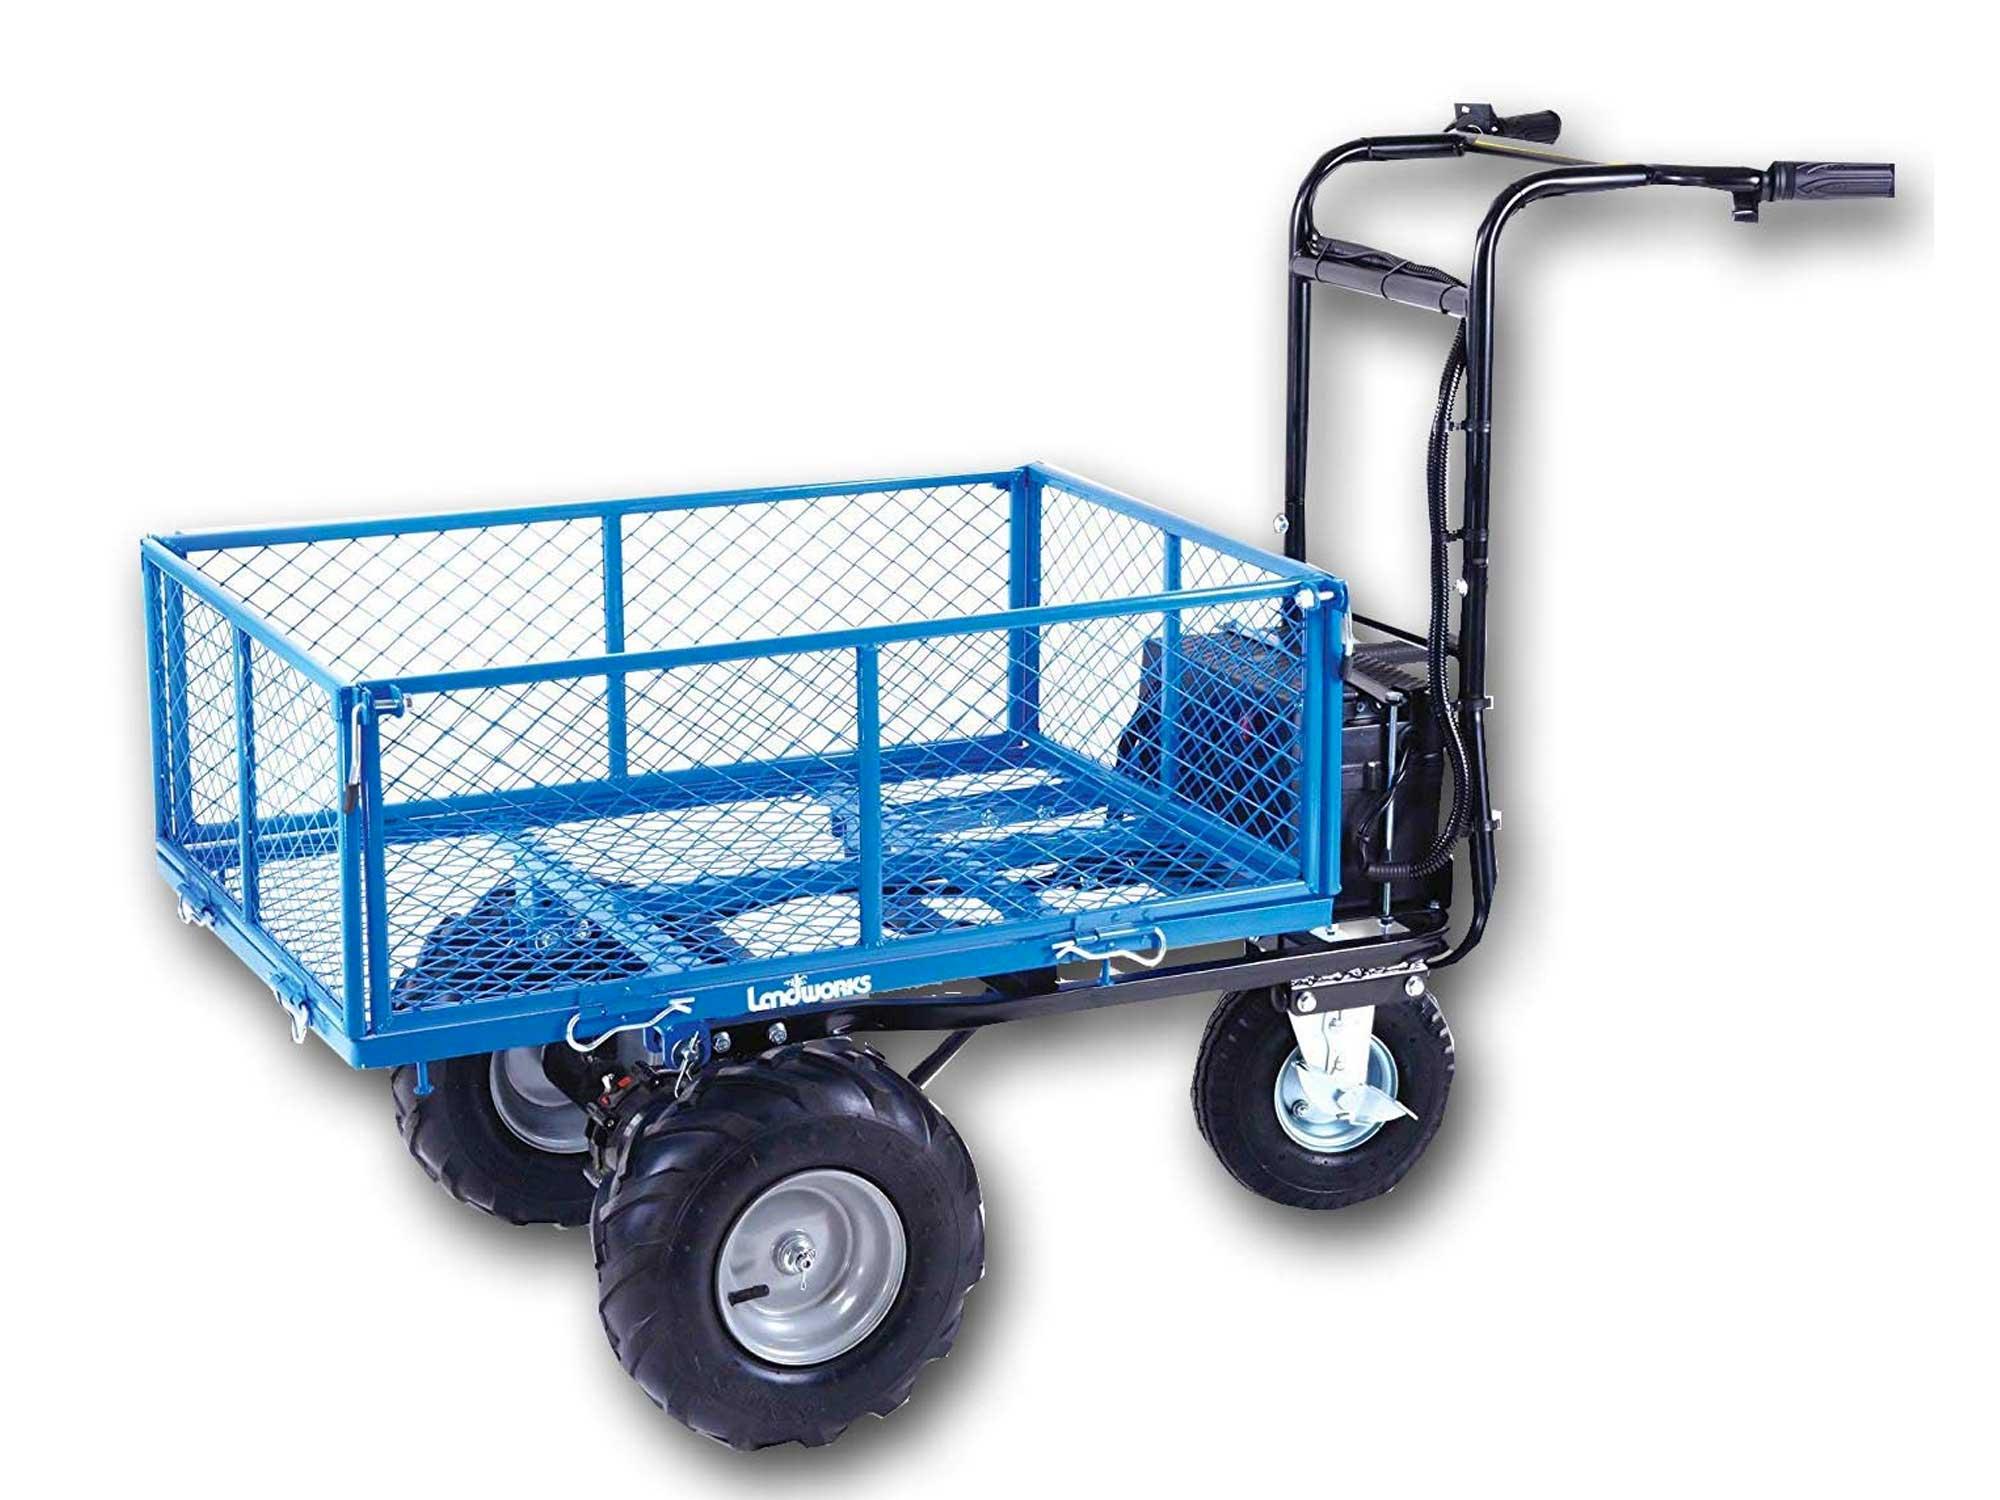 Landworks Utility Cart Hand Truck Power Wagon